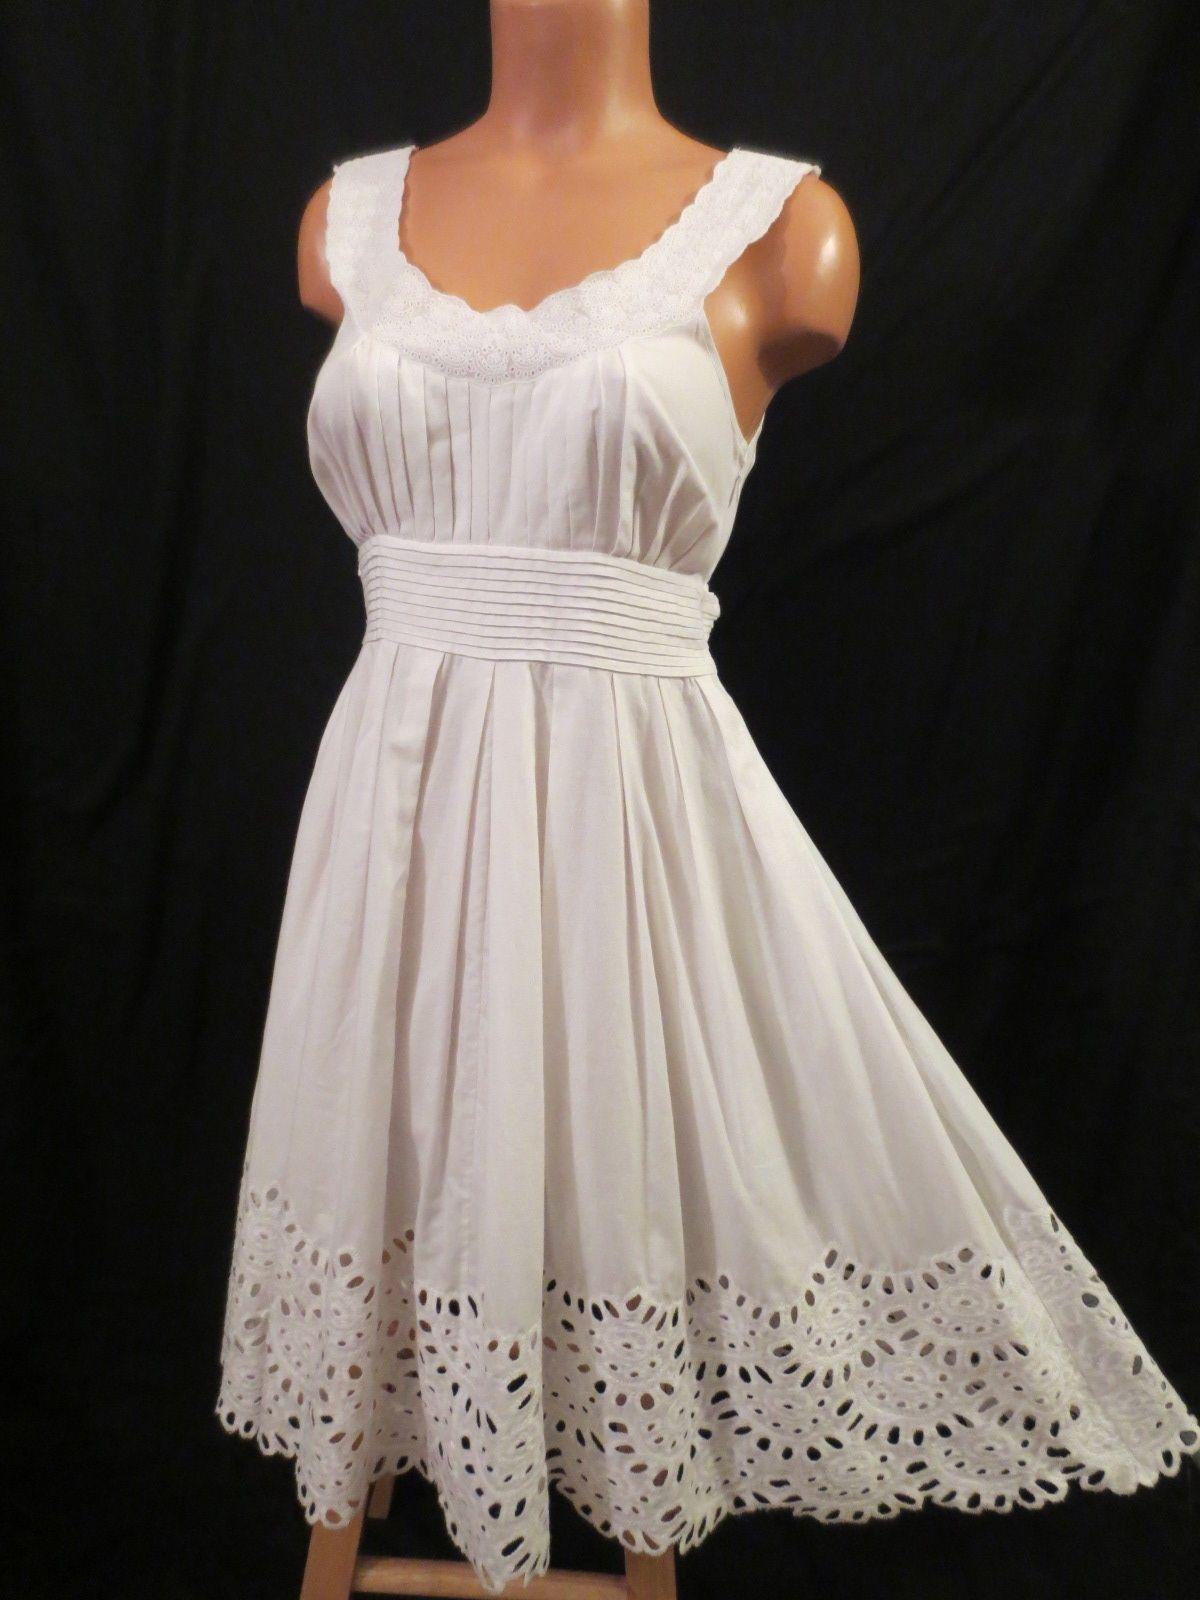 Catherine malandrino white cotton summer dress